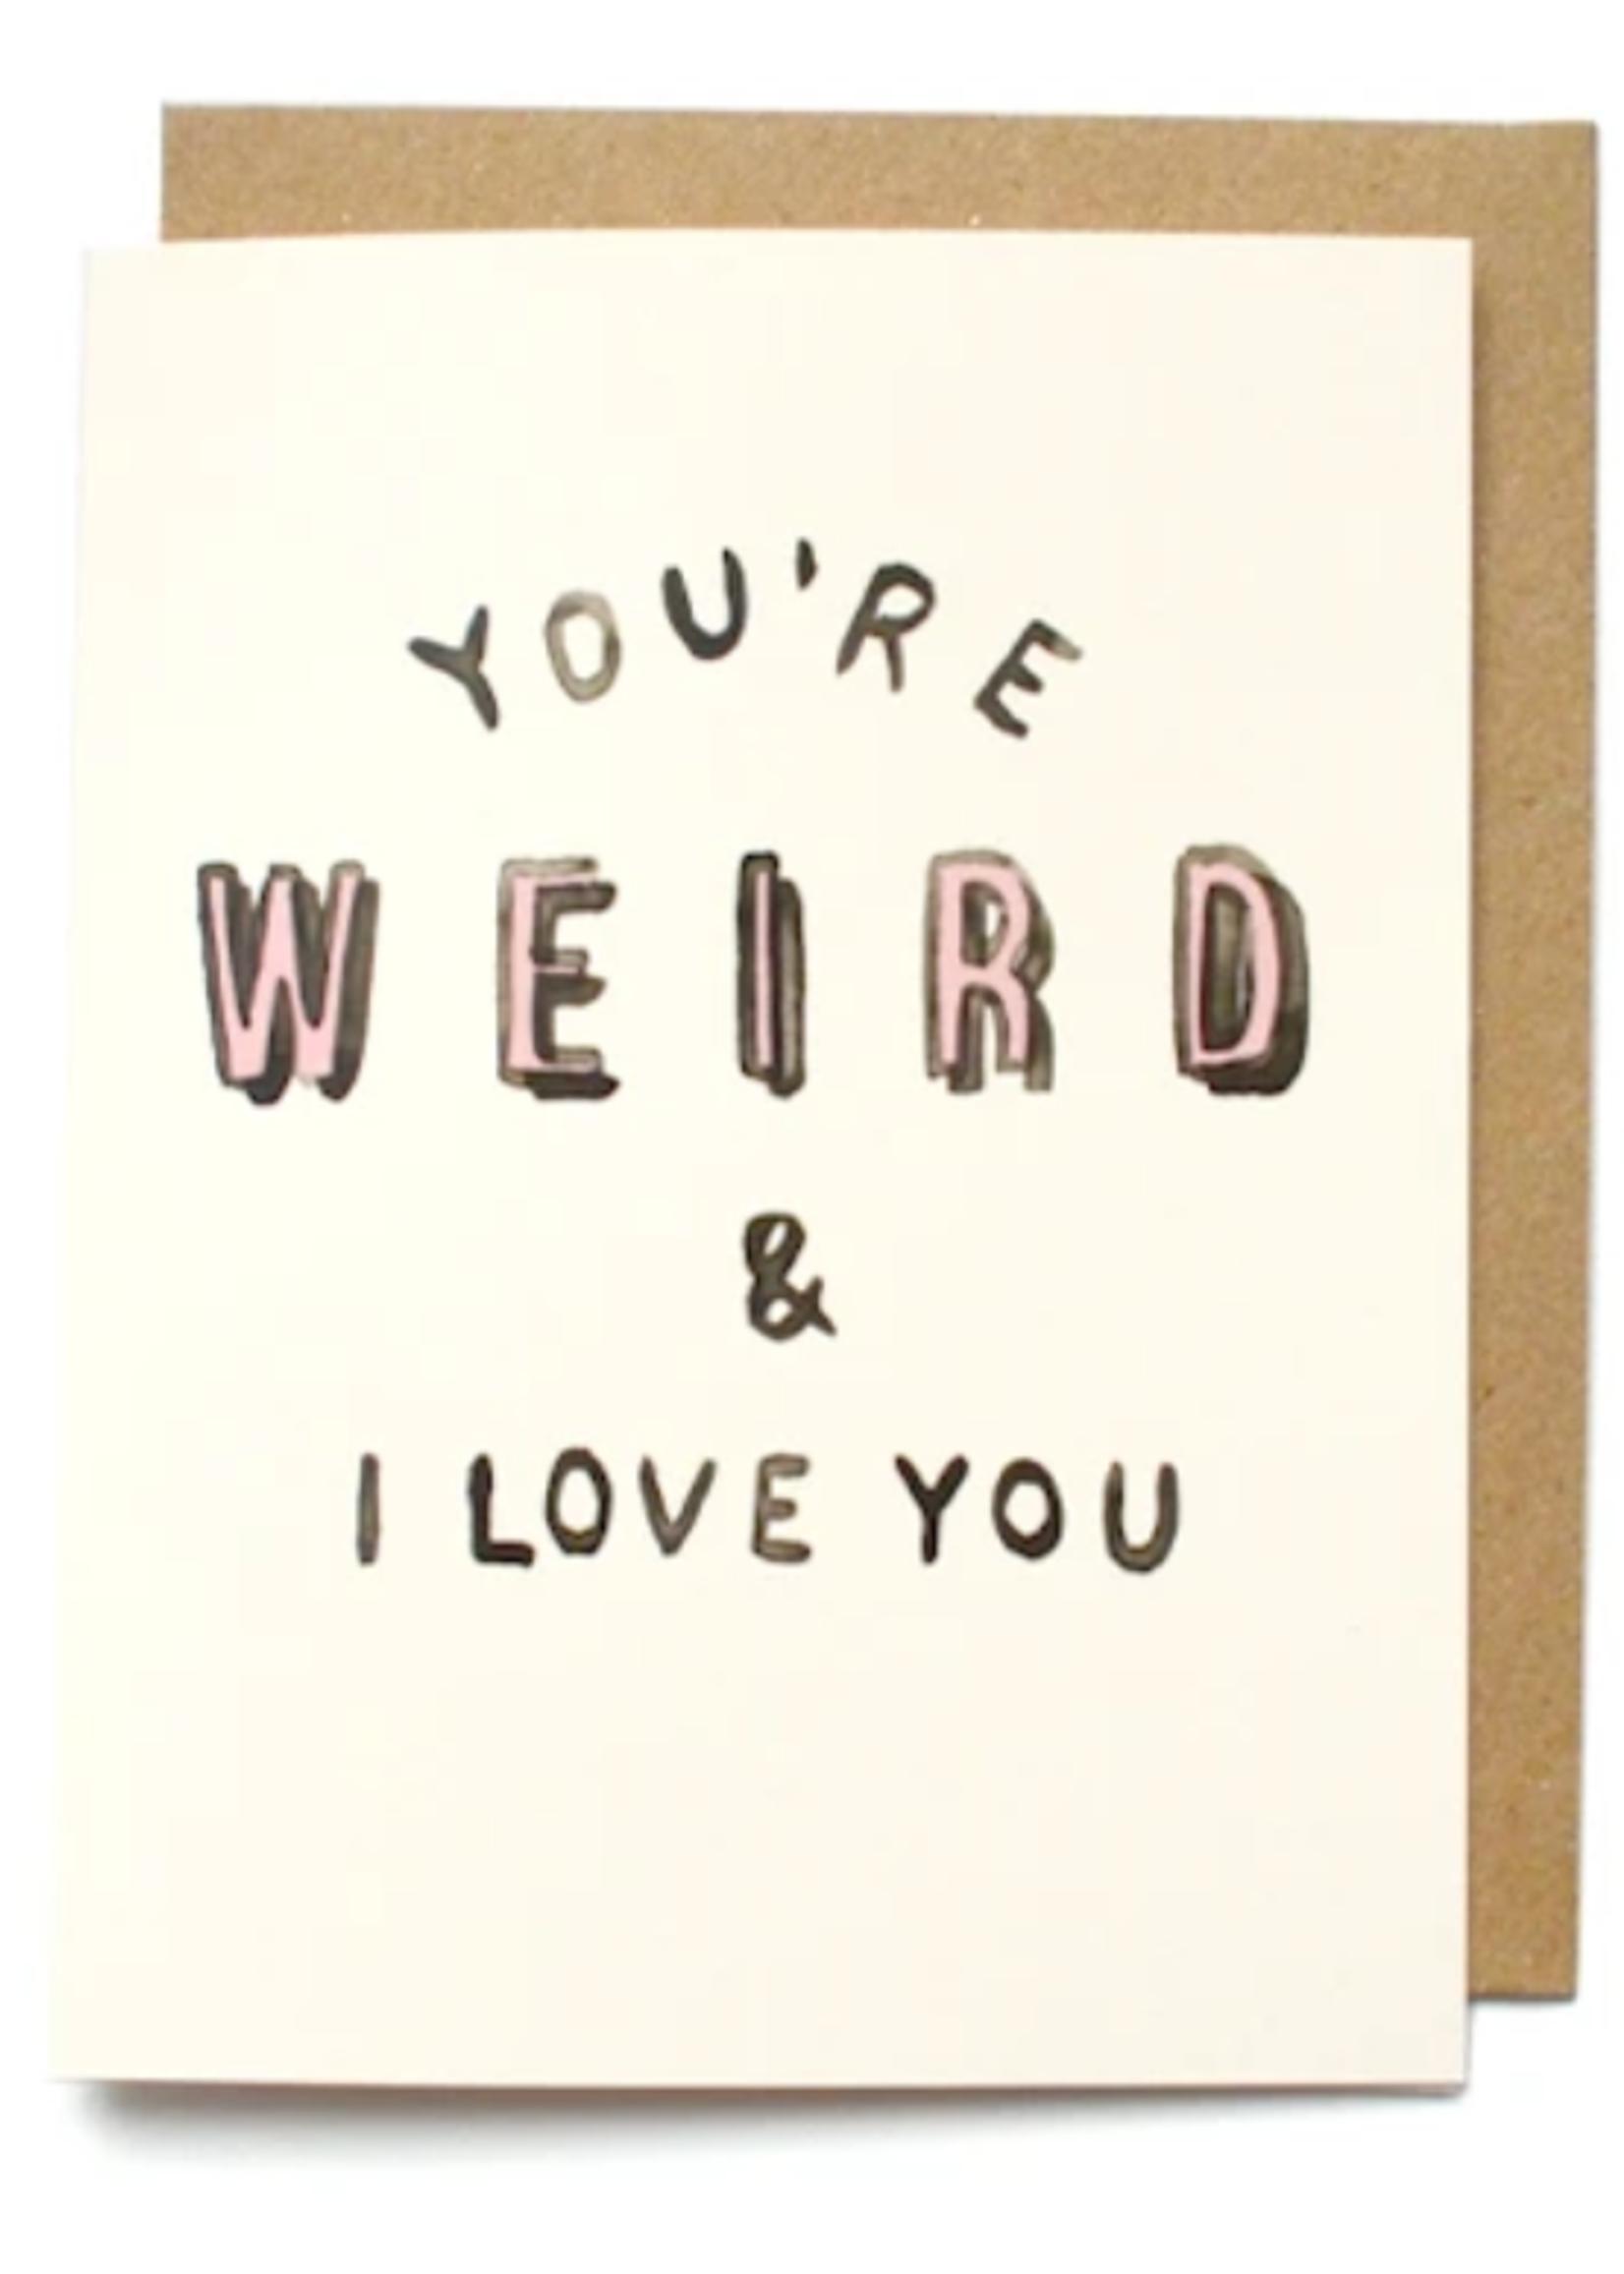 daydream prints youre weird card